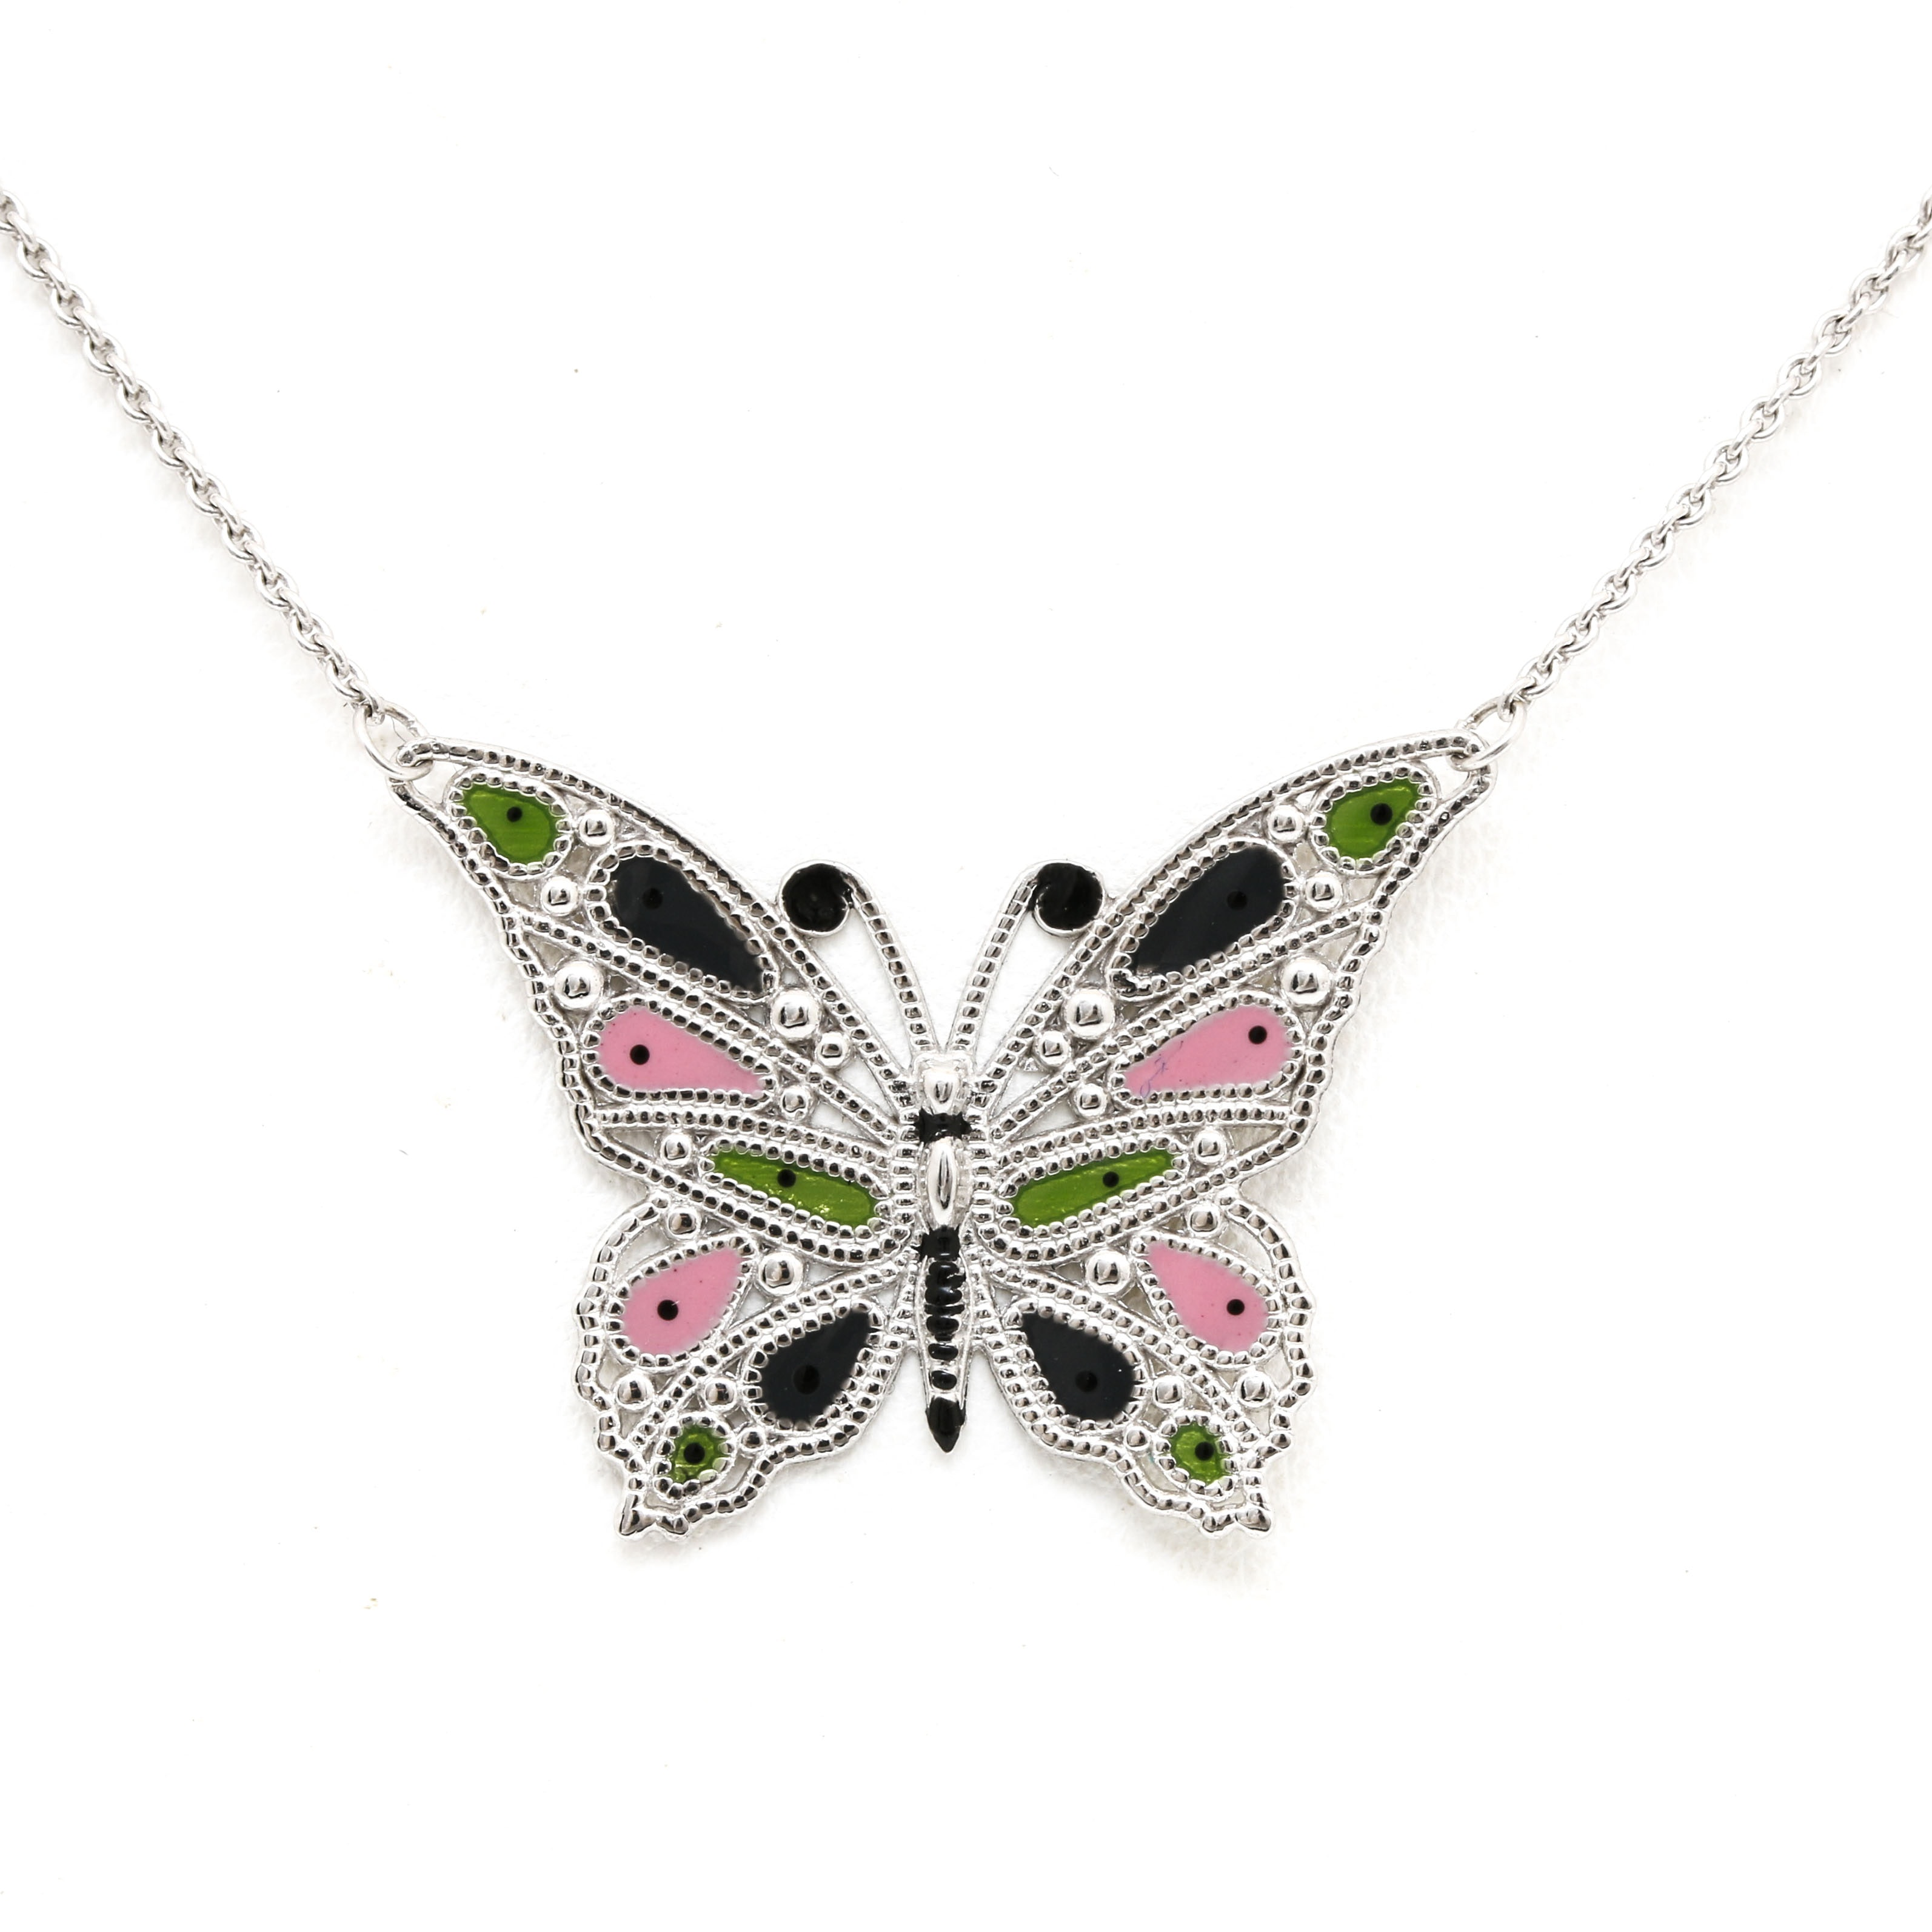 14K White Gold Enamel Butterfly Pendant Necklace